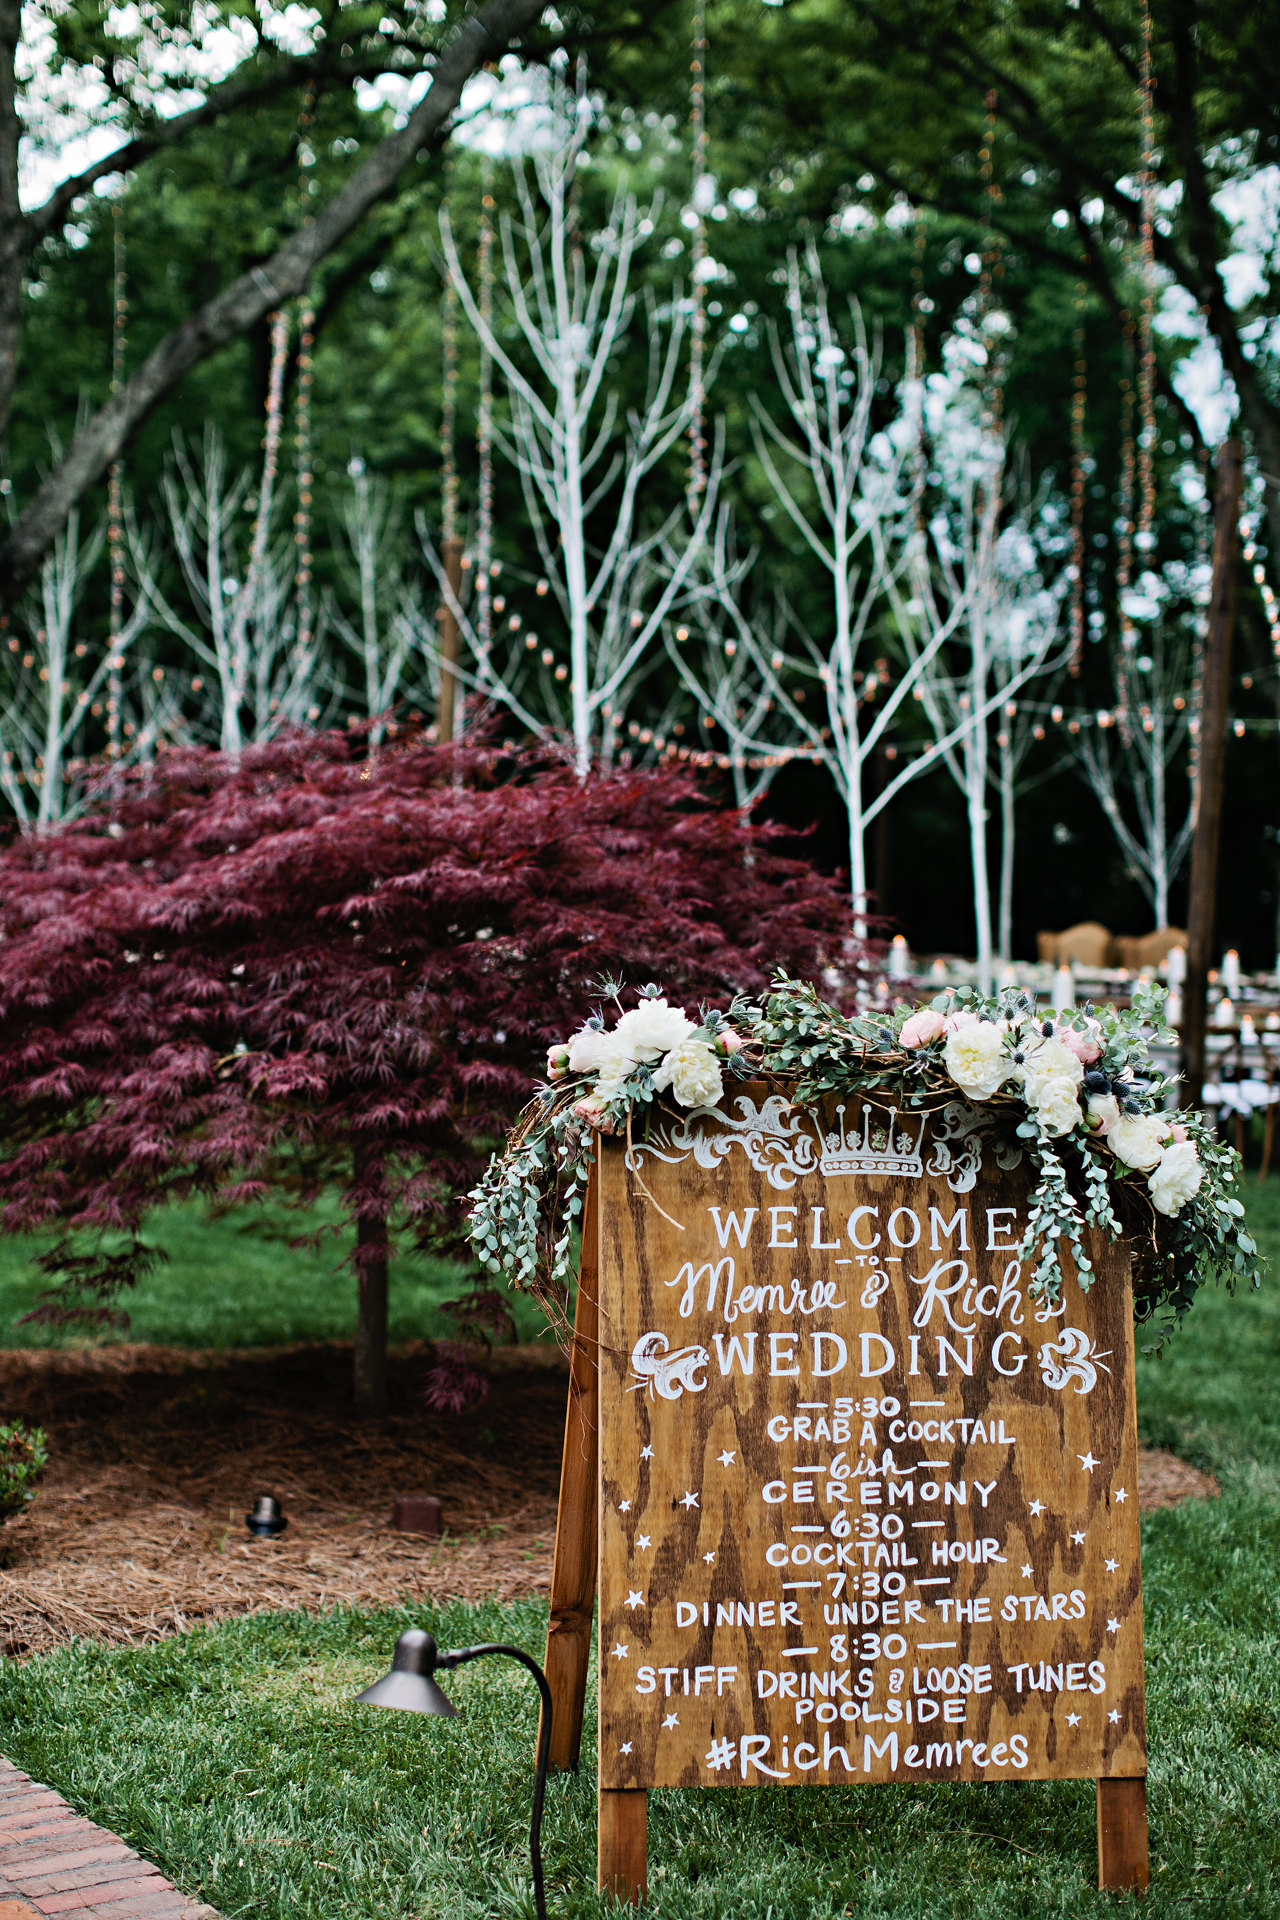 tennhens-wedding-sign